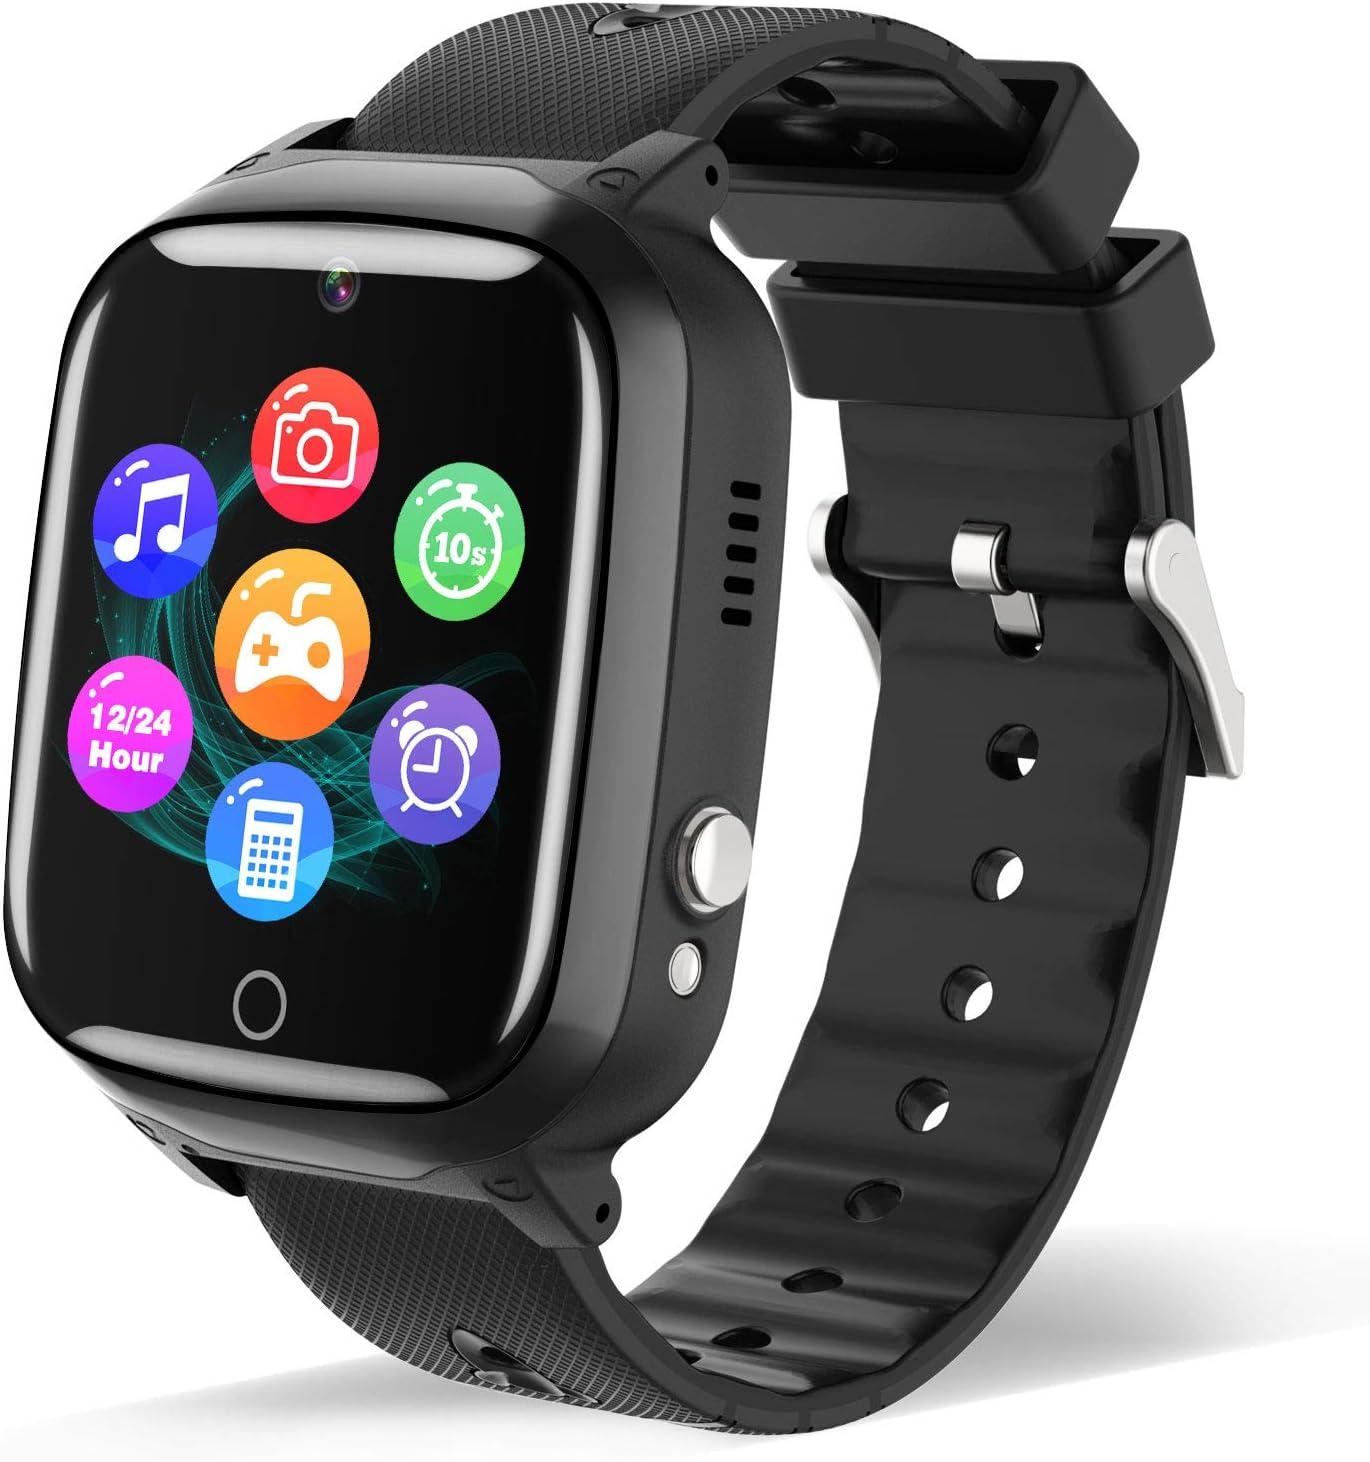 Smart Watch for Kids - Children Girls Way Max 71% OFF Arlington Mall Smartwatch Boys with 2